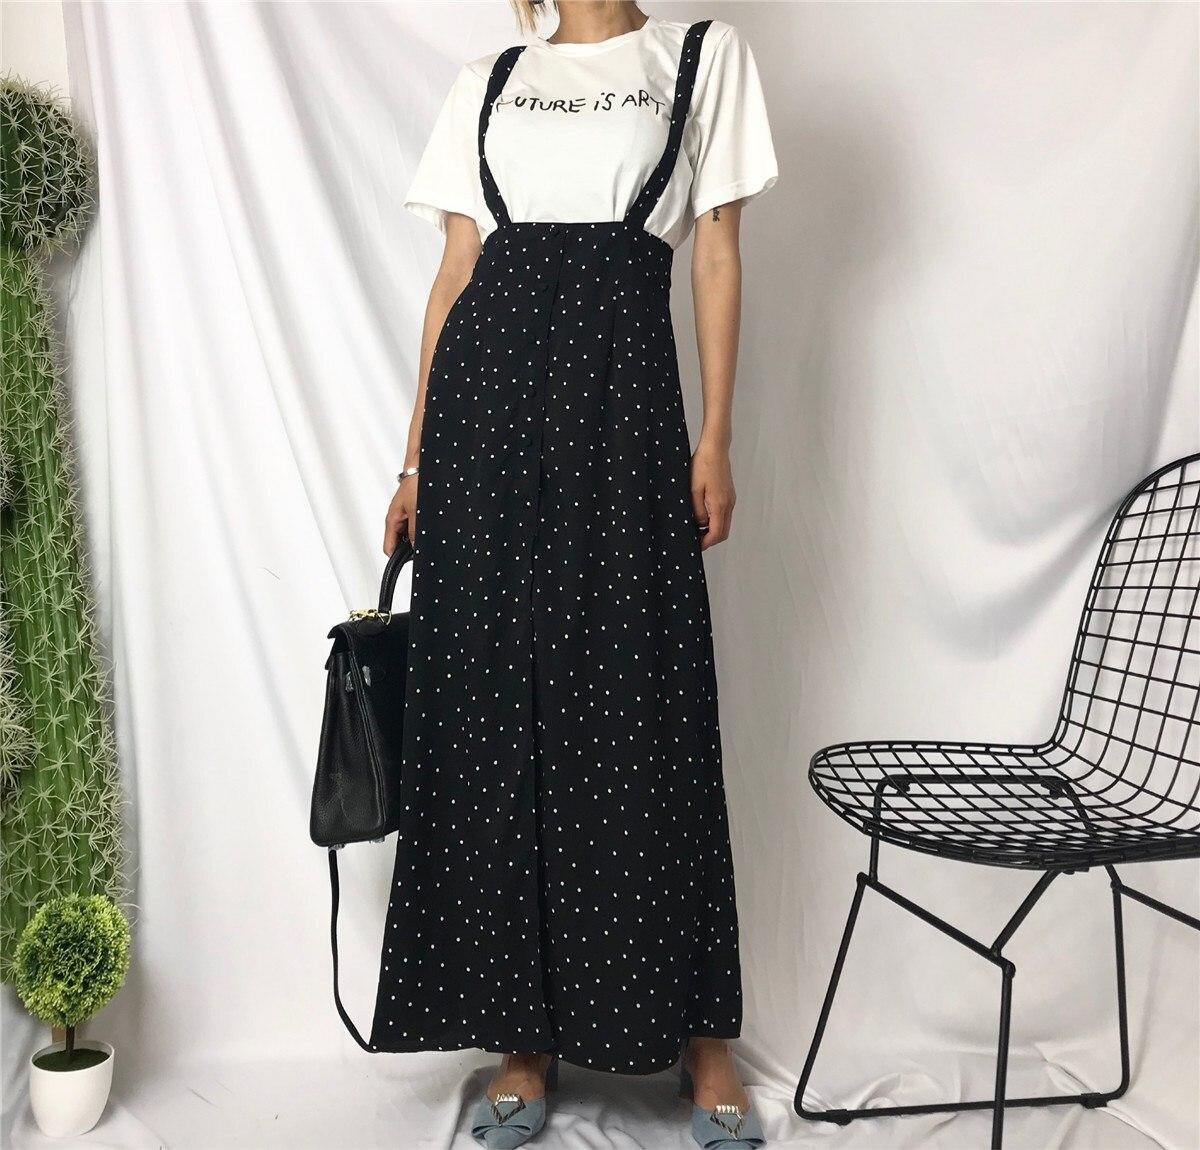 Fashion Women Vintage Dot Print Long Skirt Casual A Line Black Maxi Skirt High Waist Slim Suspenders Streetwear a-line